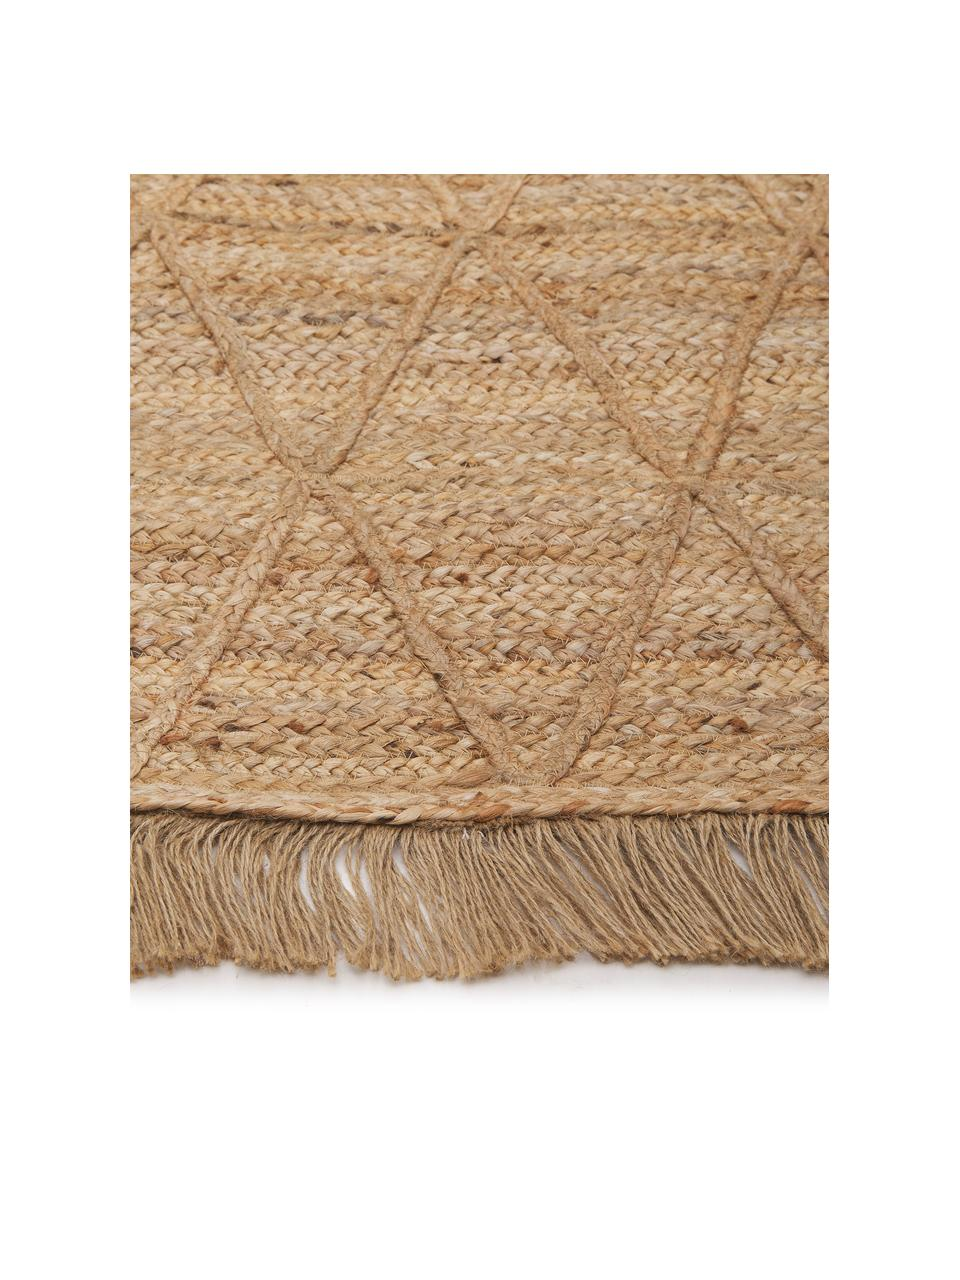 Handgefertigter Jute-Teppich Jason, 100% Jute, Beige, B 80 x L 150 cm (Größe XS)